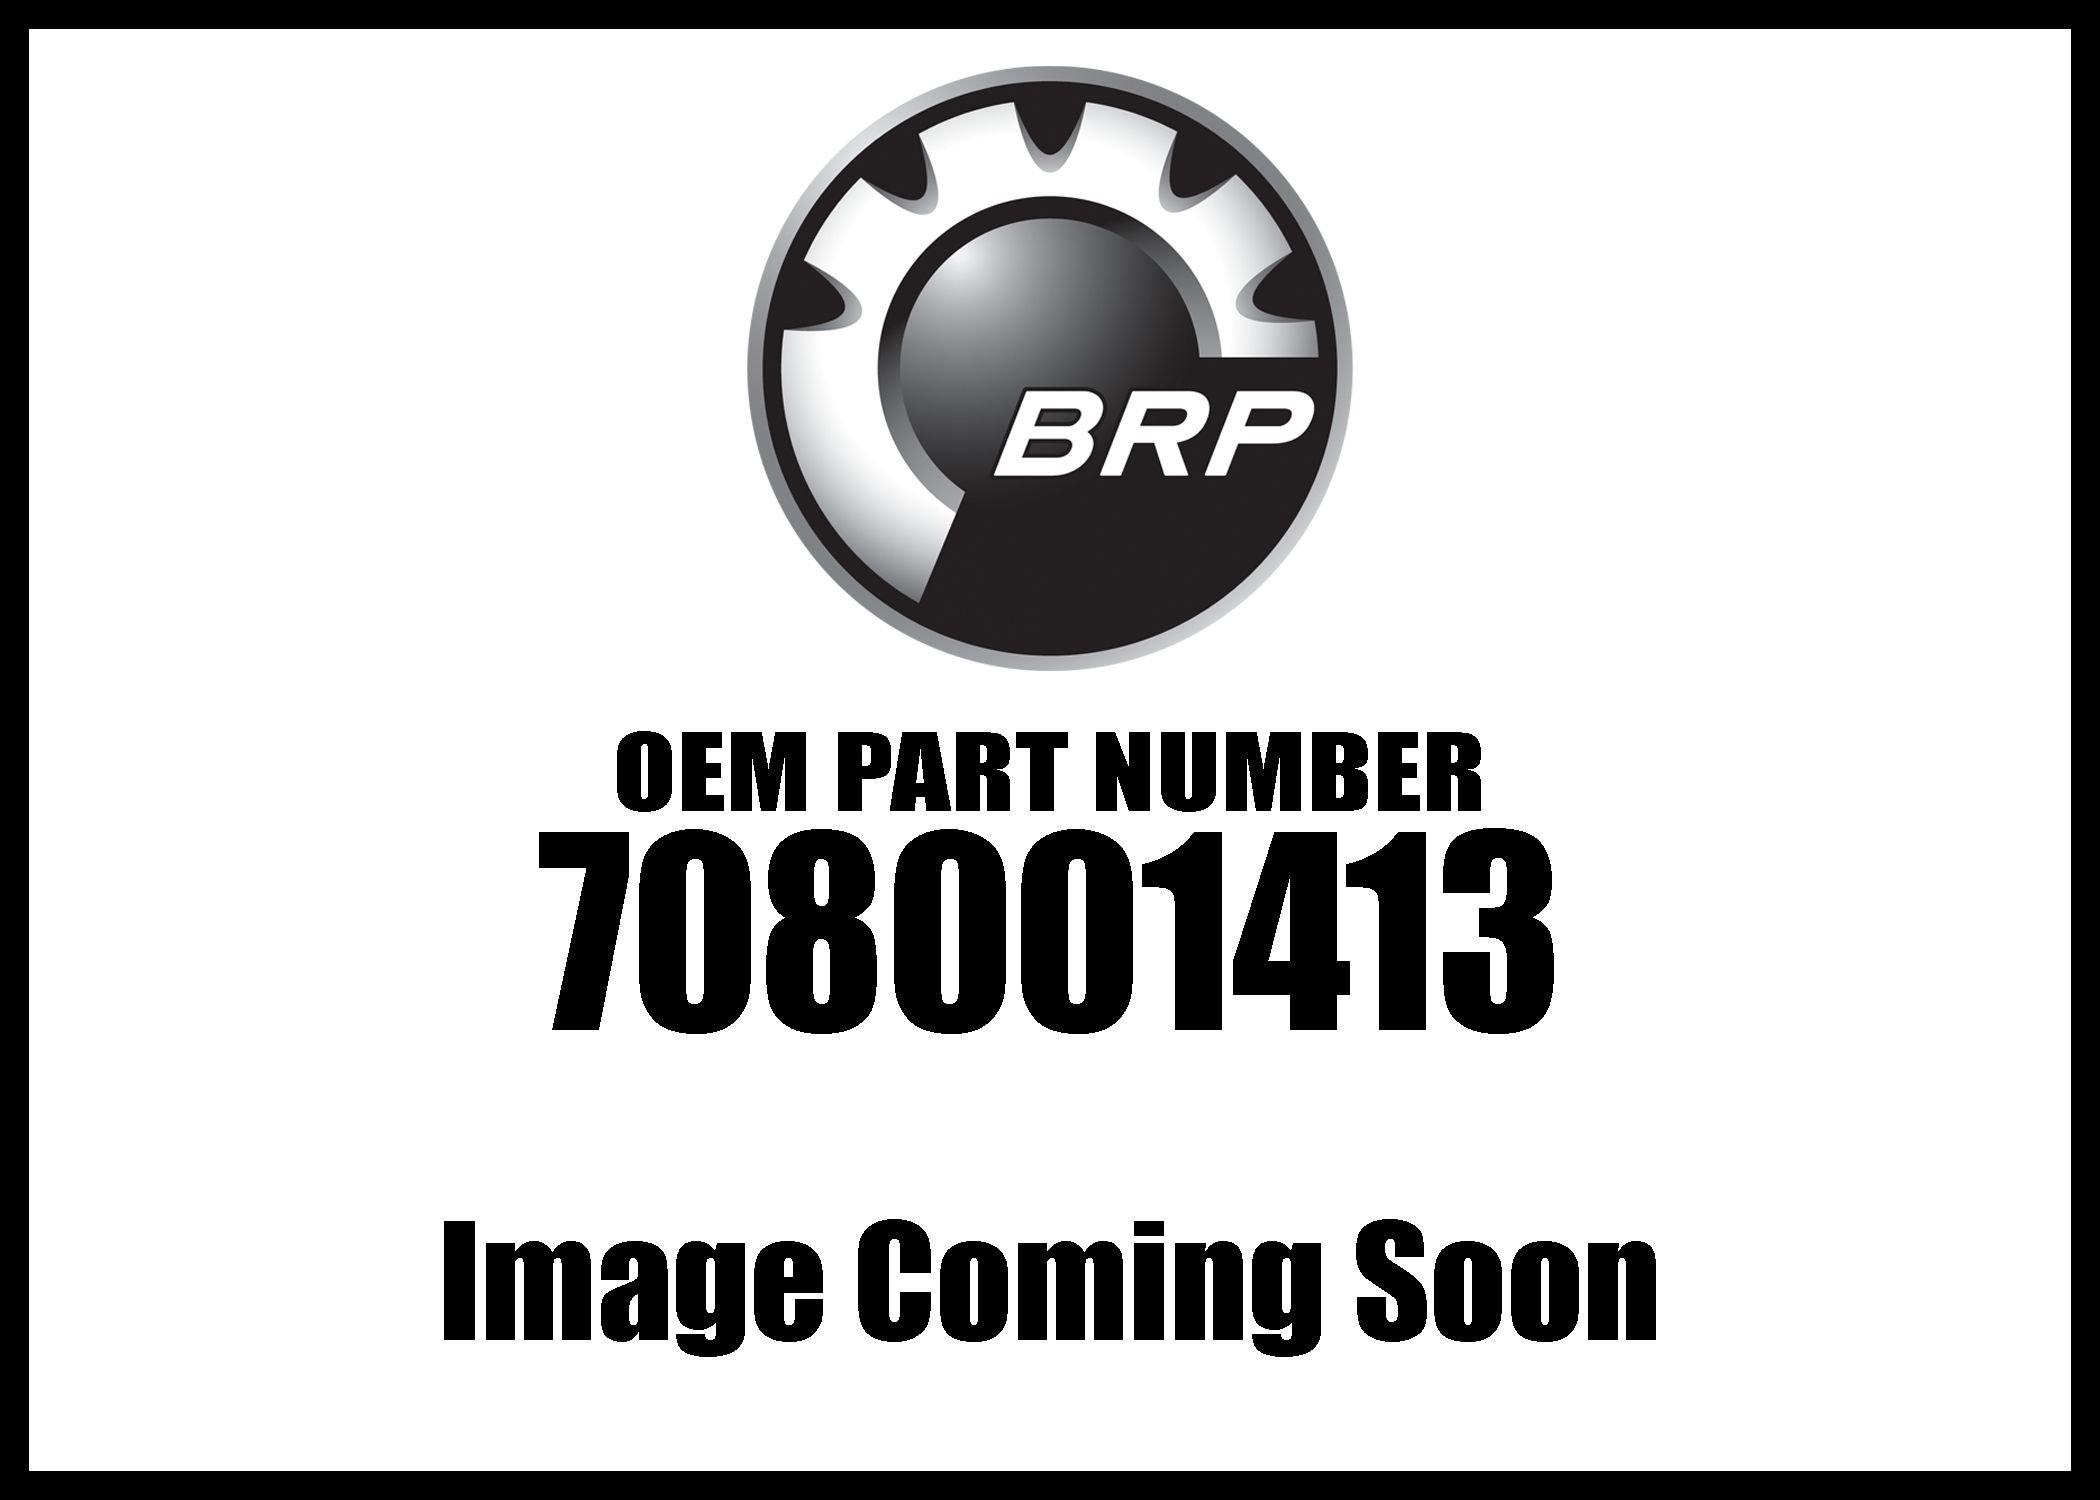 Spyder 2015-2018 F3 Lh Handle 708001413 New Oem